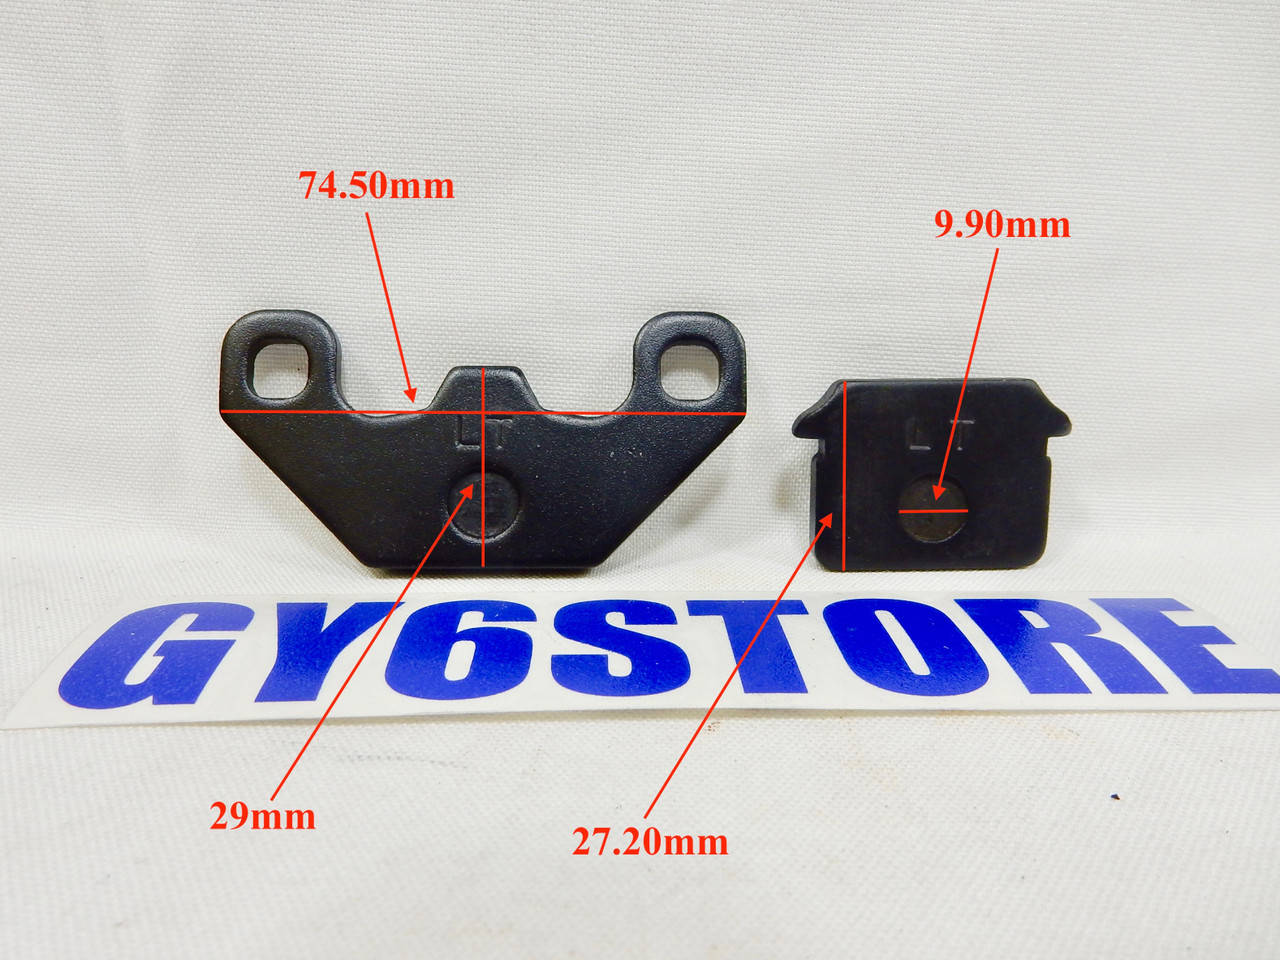 DISC BRAKE PAD SET FOR 50cc 70cc 90cc 110cc 125cc SCOOTERS ATVS DIRT (TYPE 4)